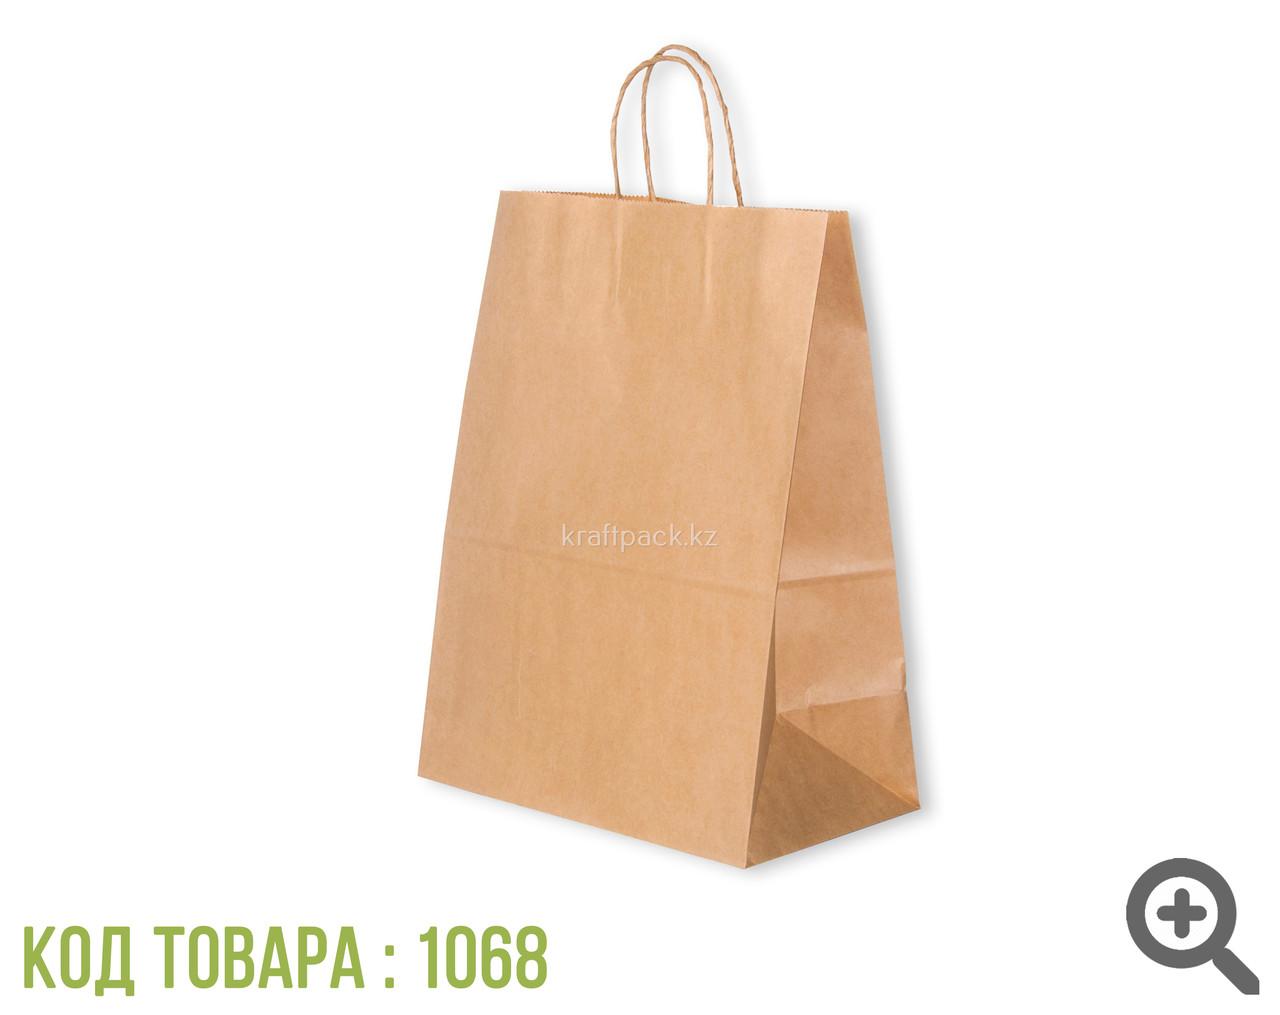 Бумажный пакет из крафт бумаги, бурый с ручкой 70гр 260*150*350 (200шт/уп)